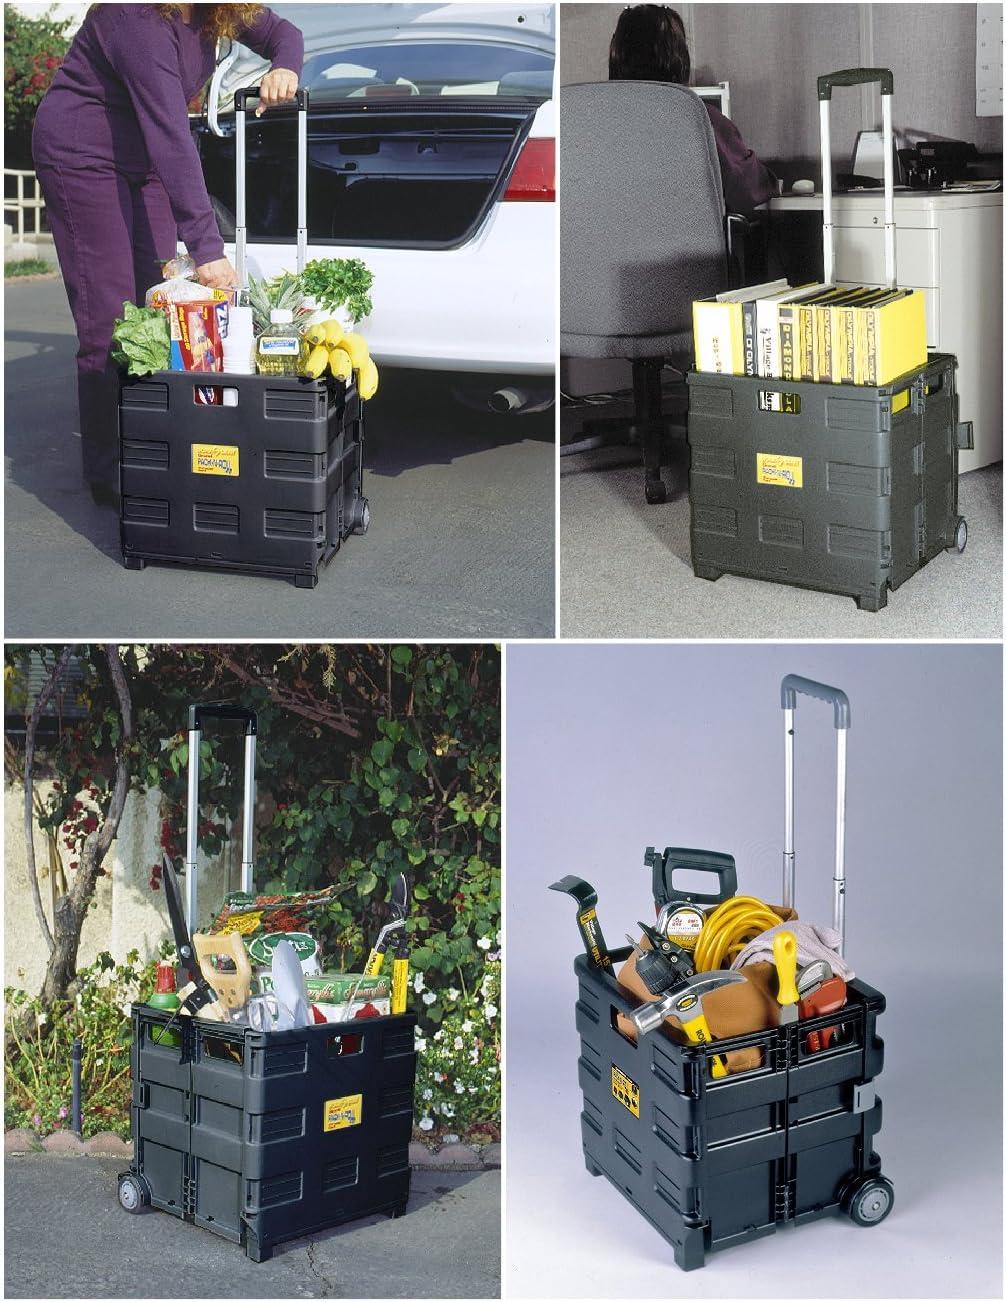 B000UZ0P7I Olympia Tools Grand Pack-N-Roll Portable Cart, 85-010, Black 71ztOoD-XbL